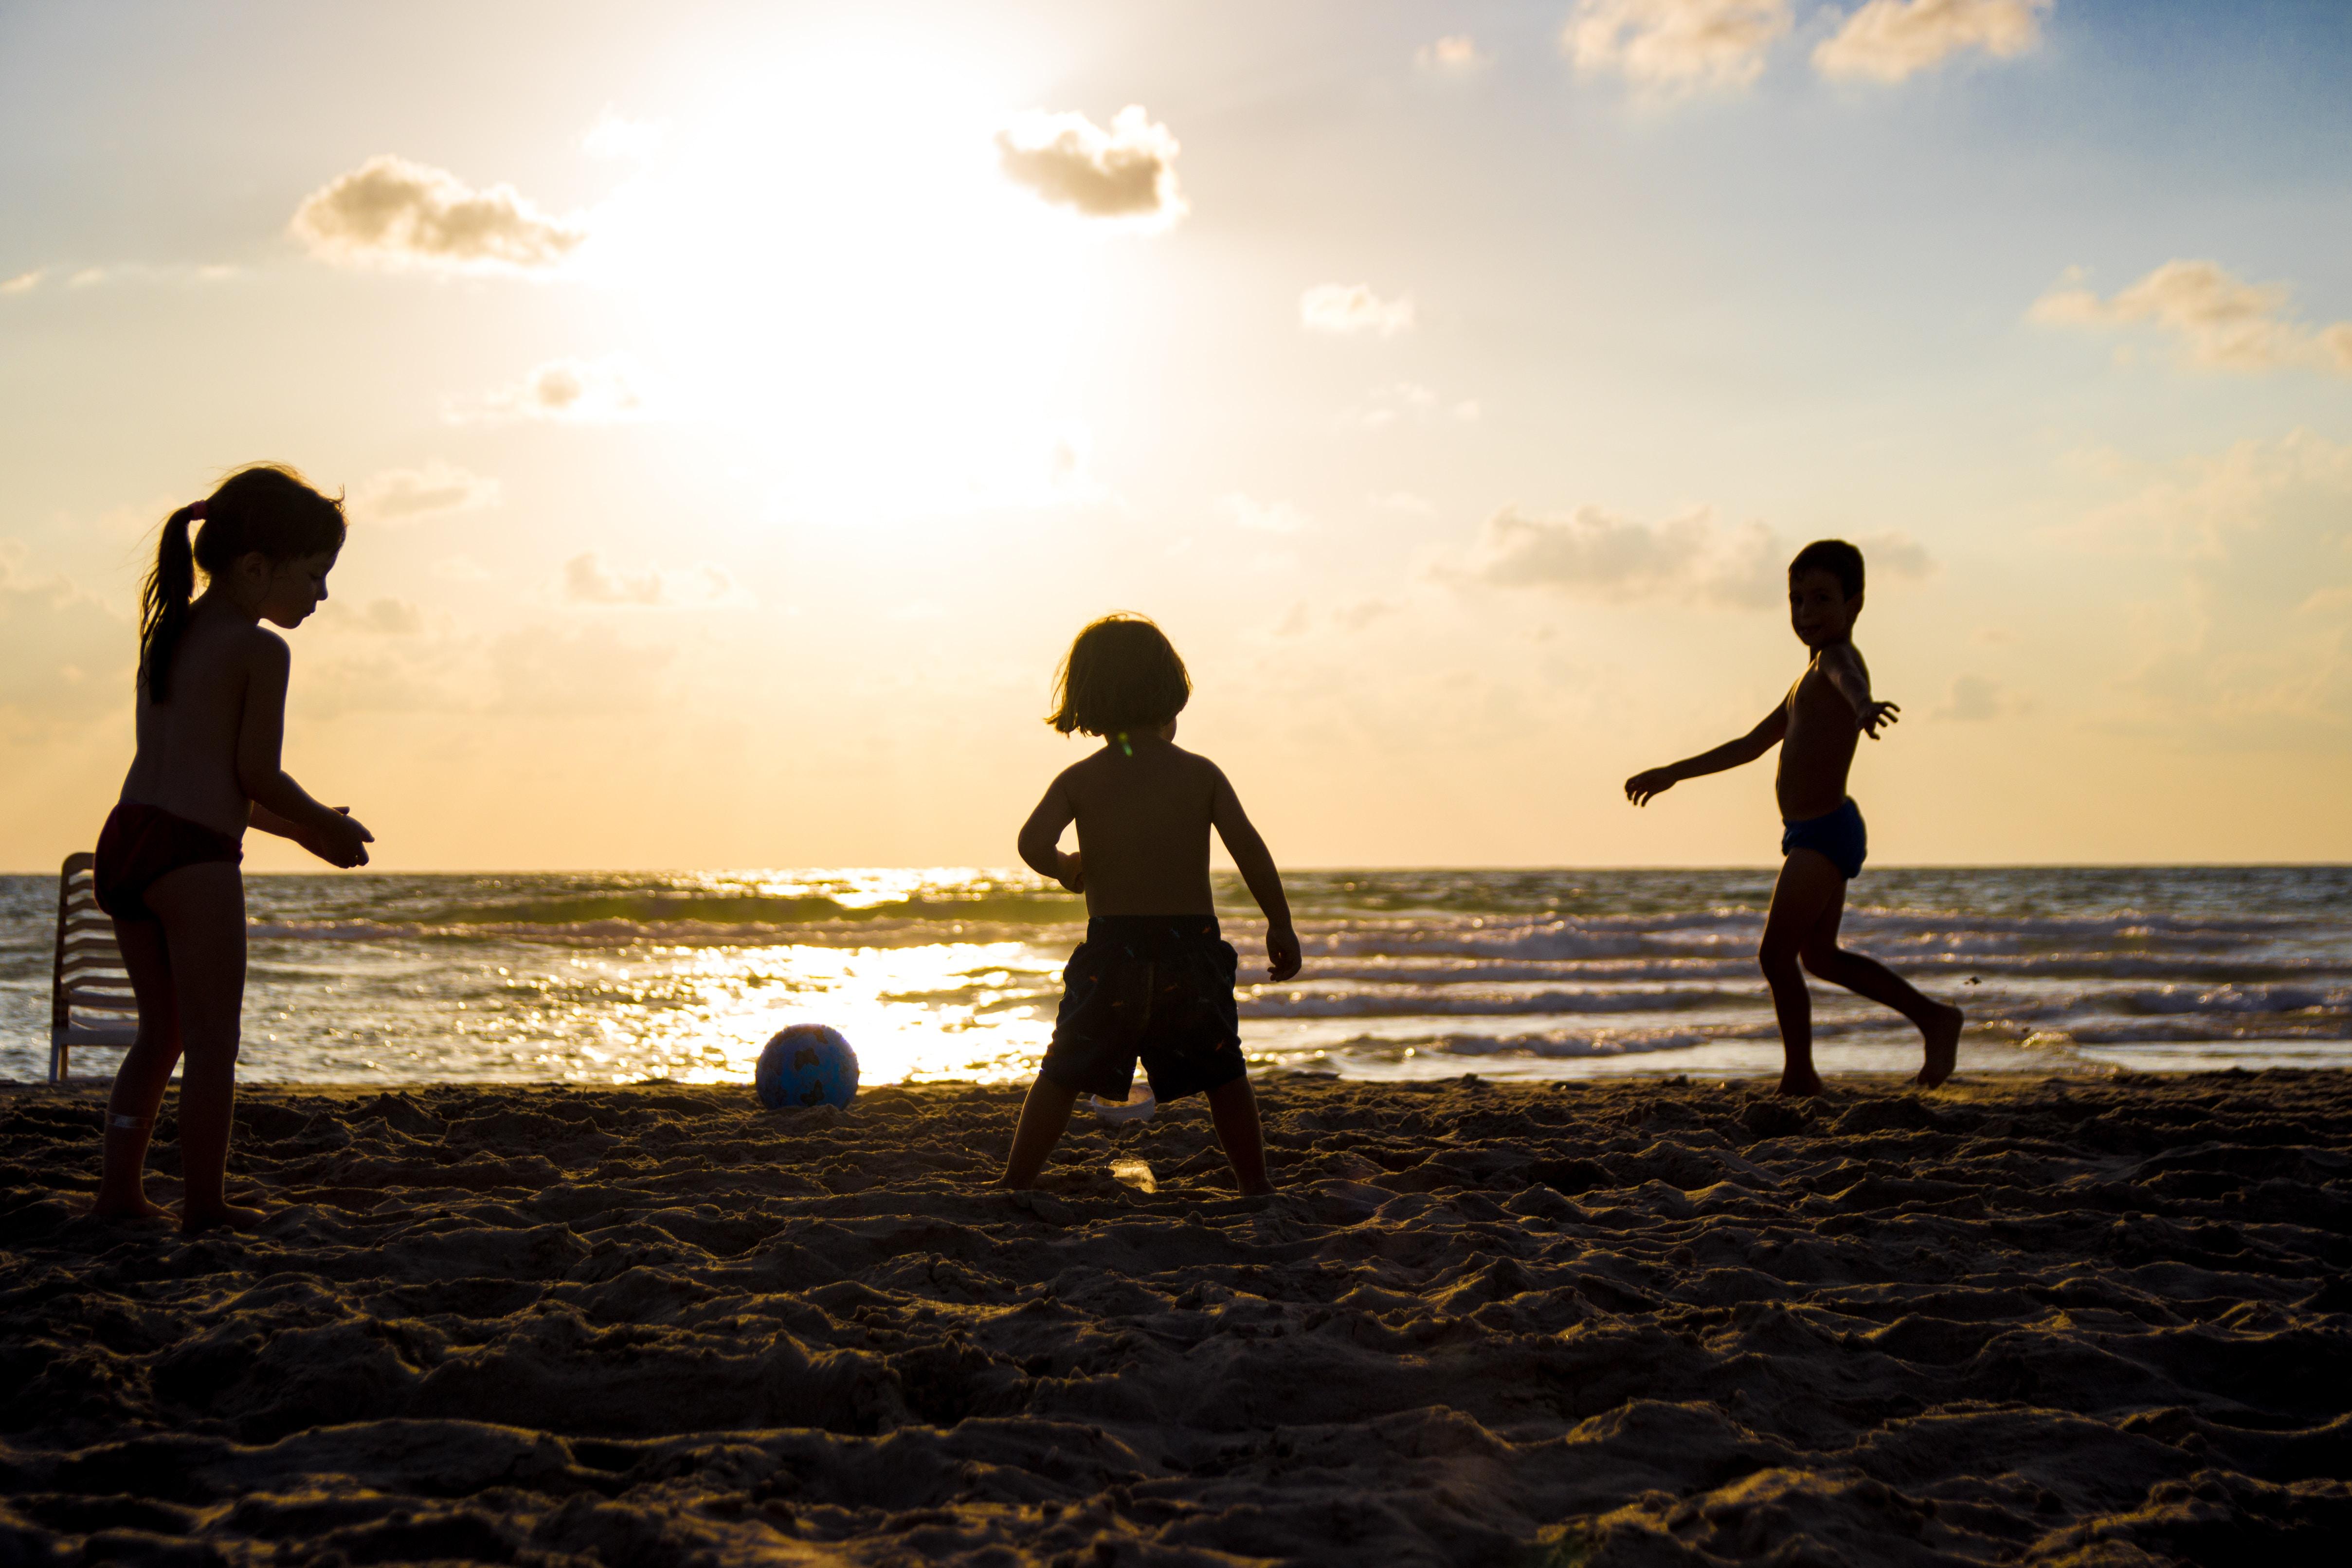 silhouette of three children on beach